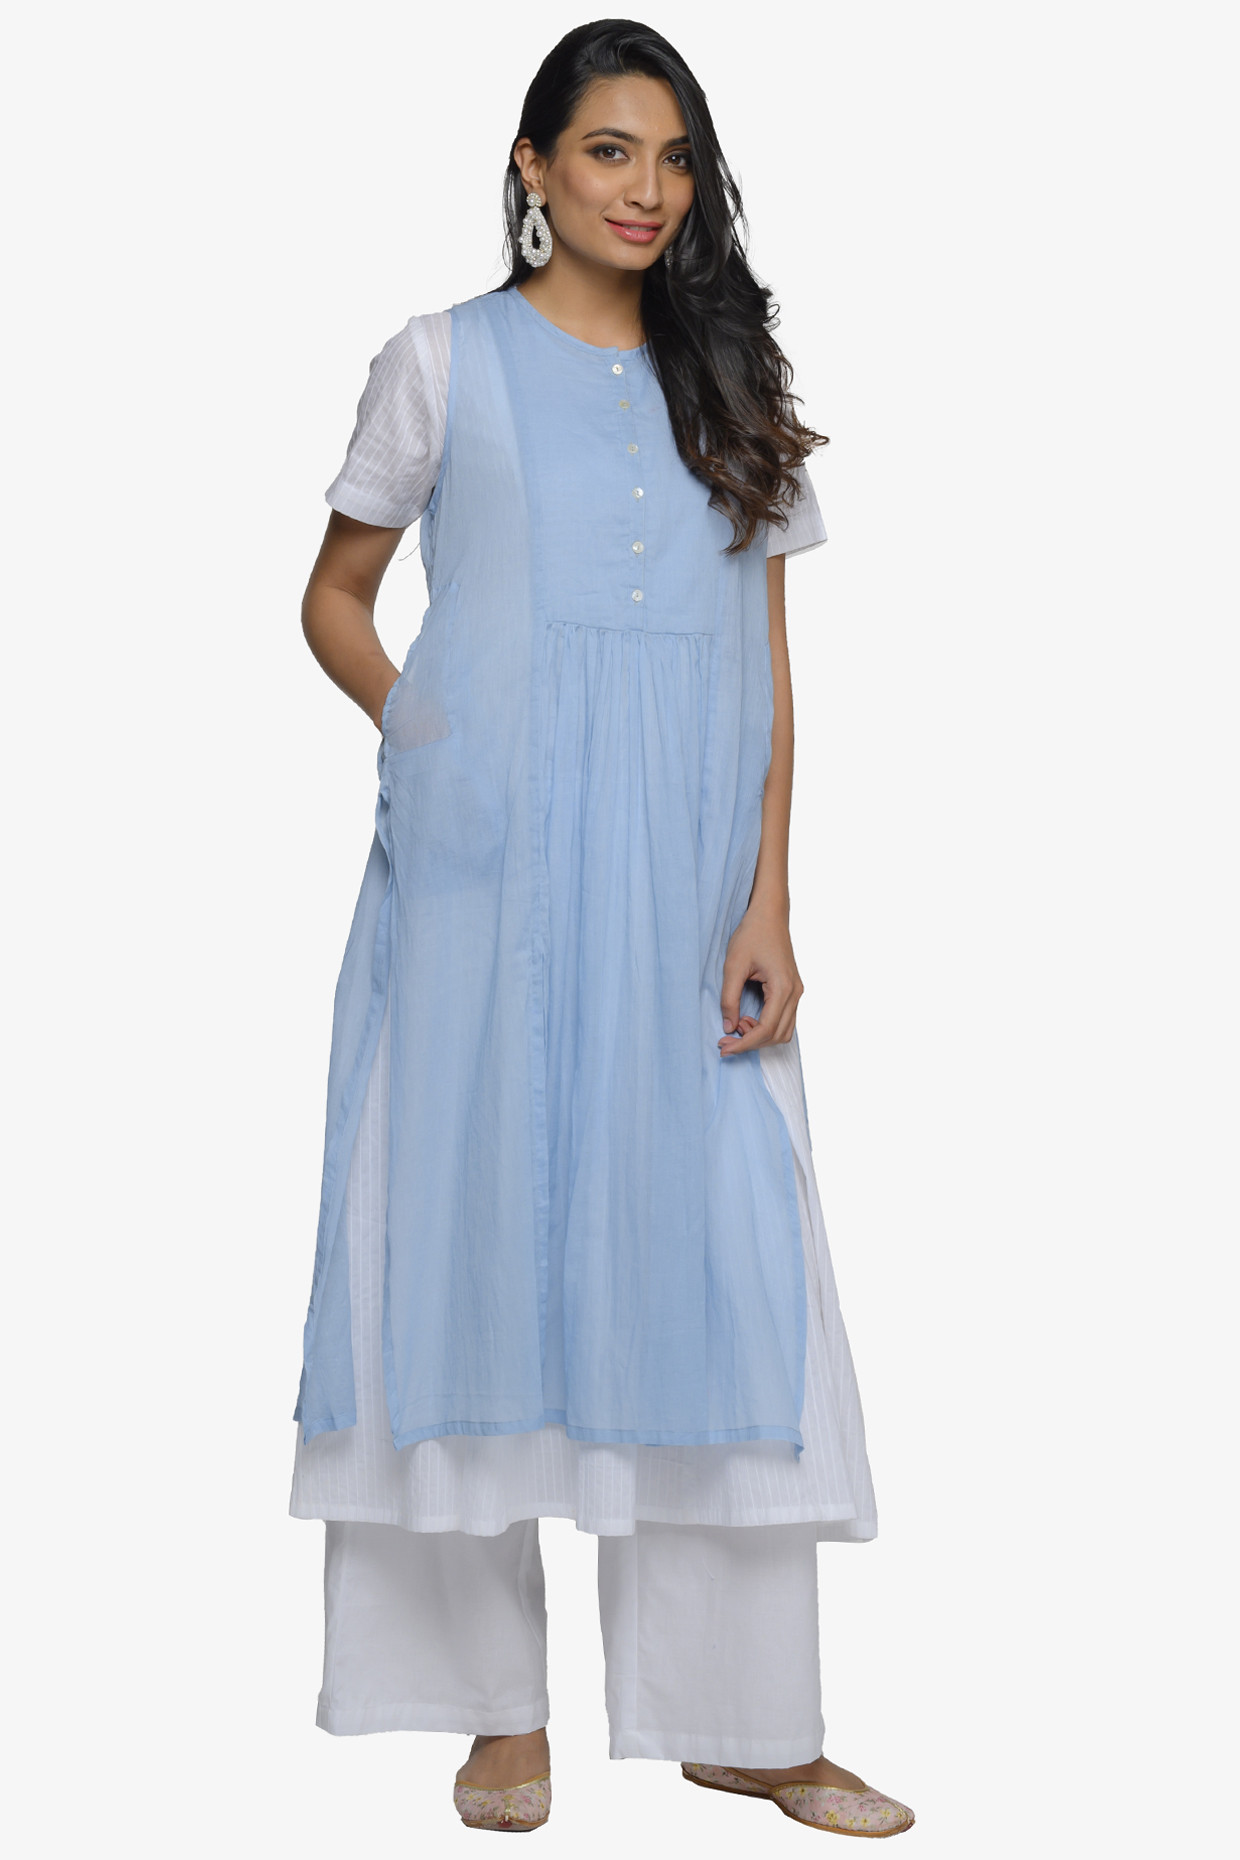 White Flared Cotton Kurta With Sleeveless Powder Blue Slip Dress by House Of Idar